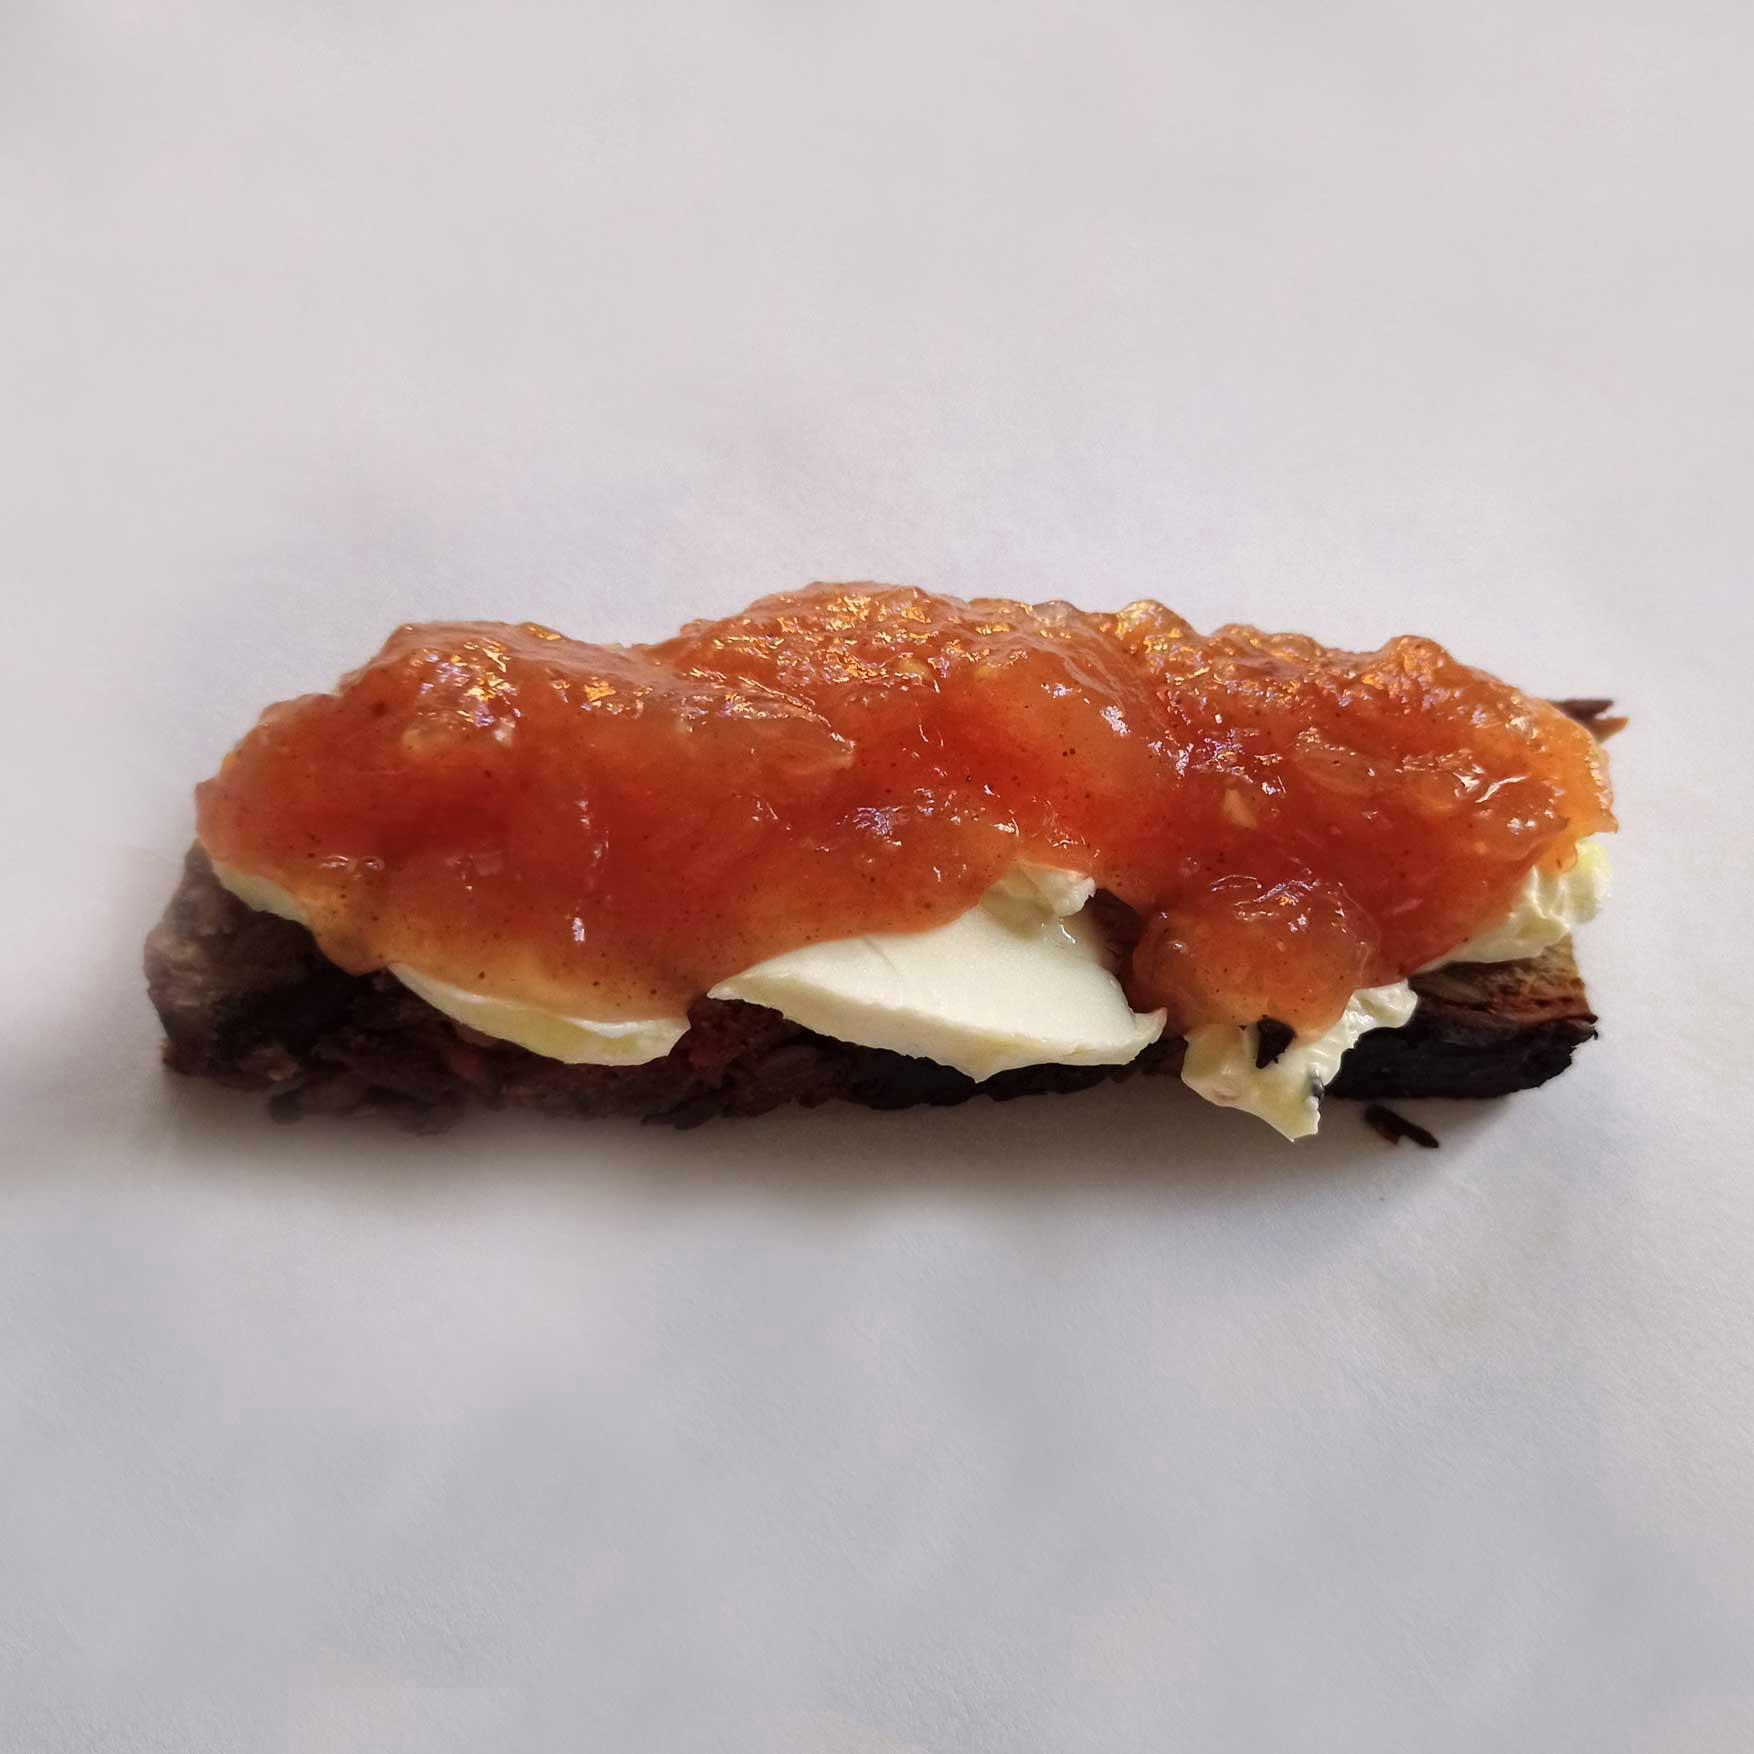 Cat.Rais. No. ATV297 Marmalade and Butter On Toast Kim Okura 2020